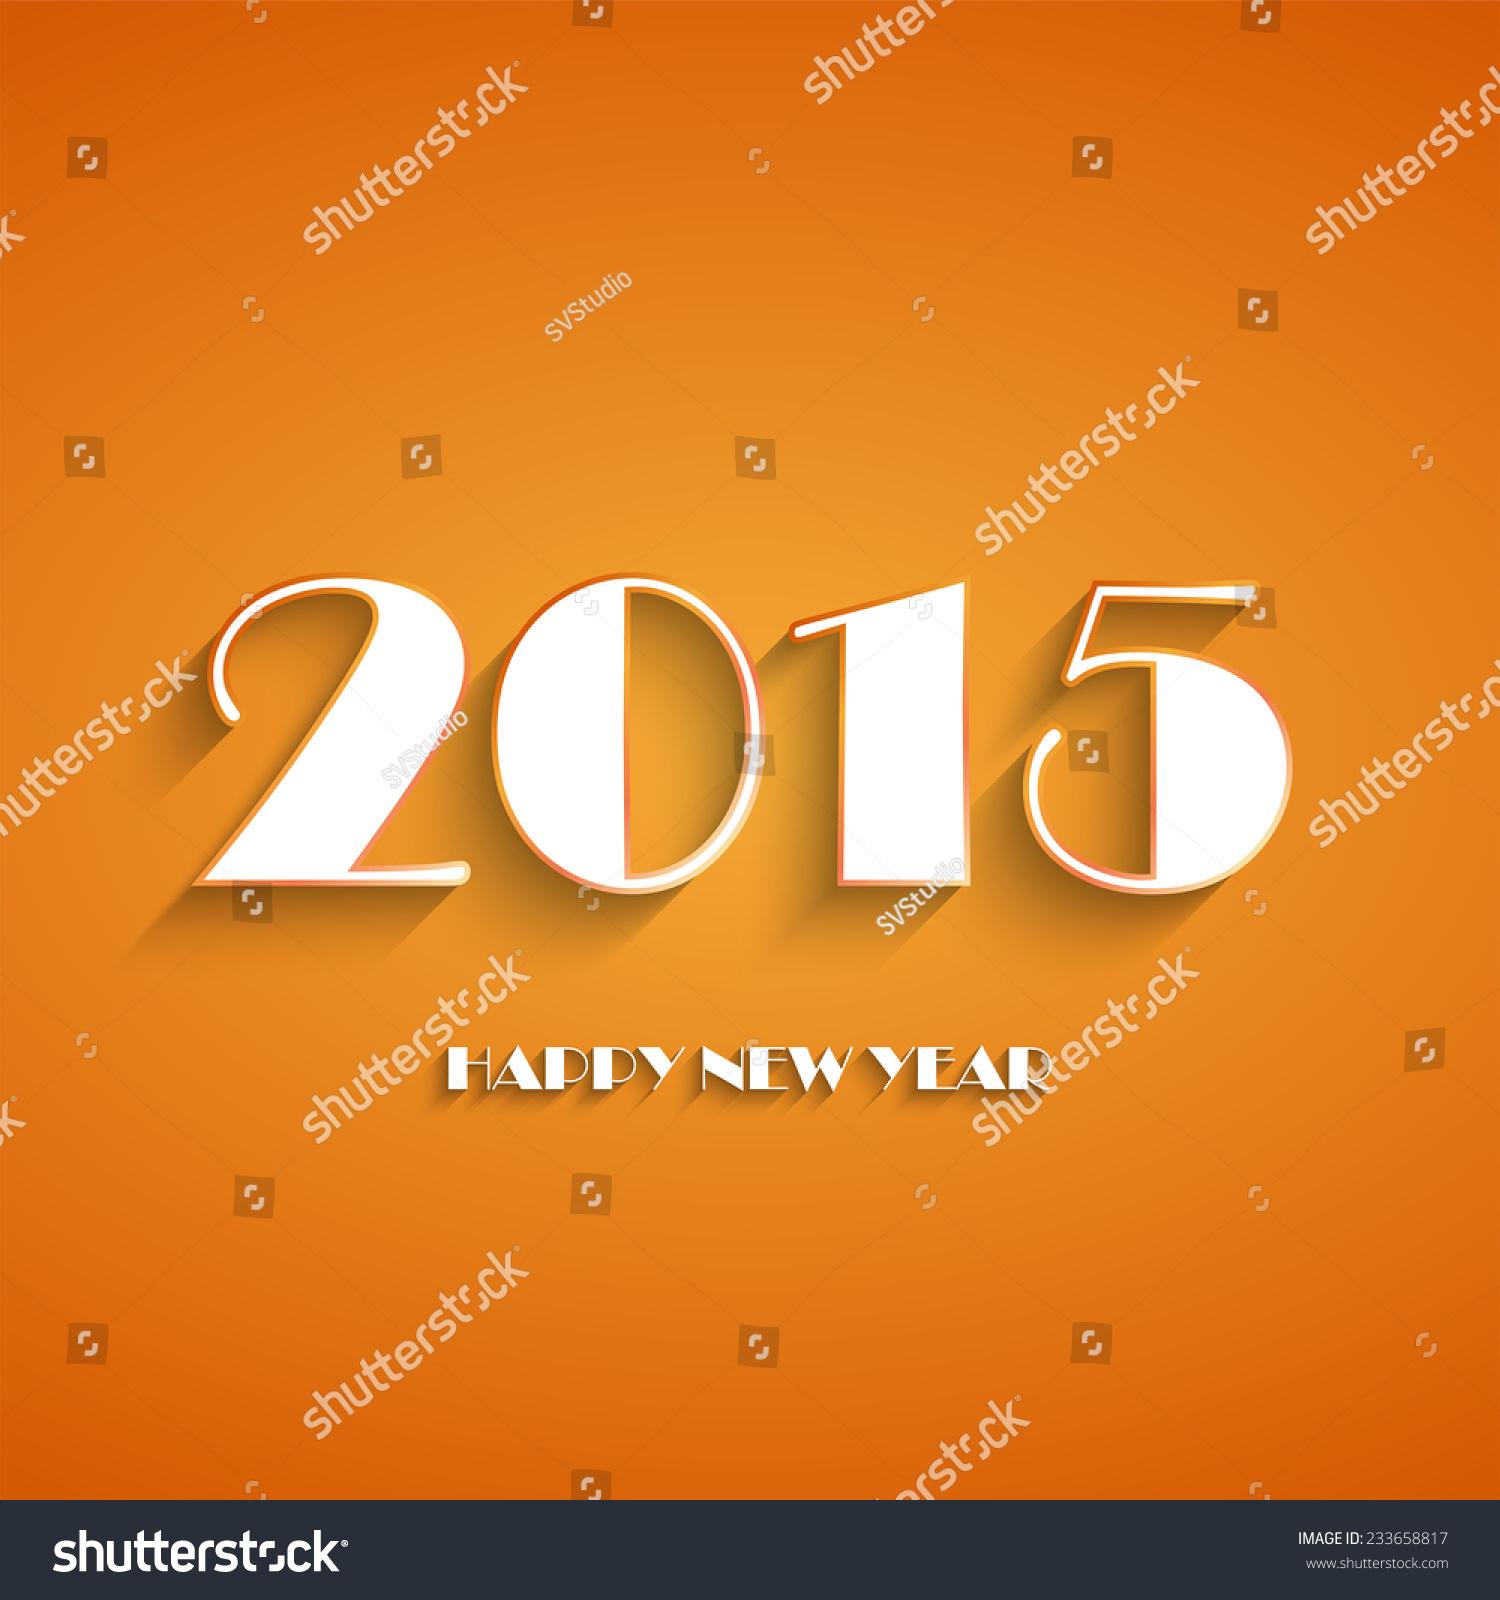 Happy new year 2015 creative greeting card logo design in orange and id 233658817 m4hsunfo